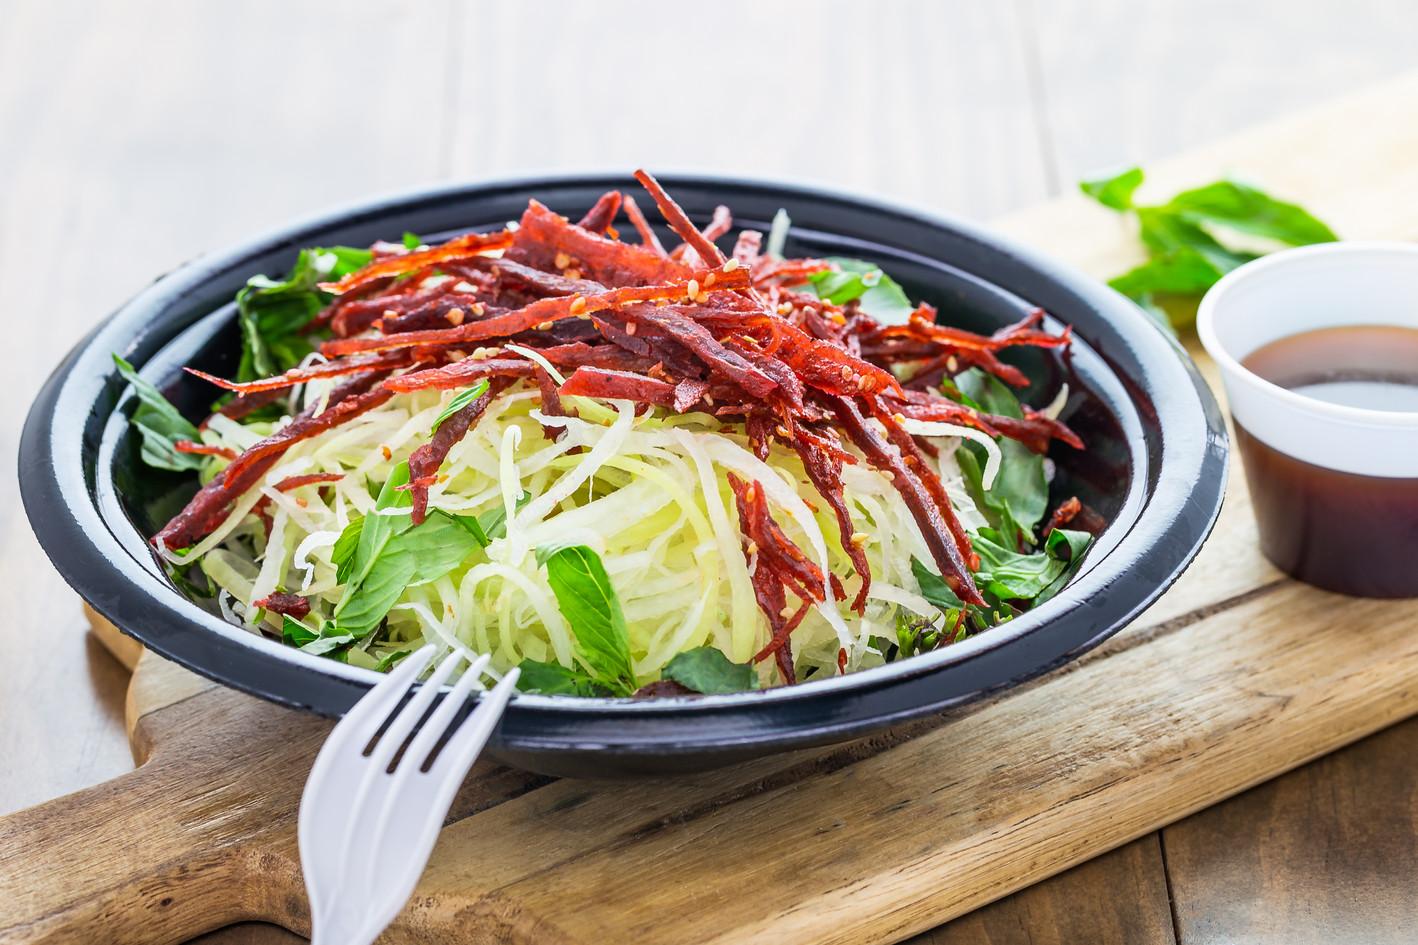 Gỏi Đu Đũ Khô Bò  Green Papaya Beef Jerk